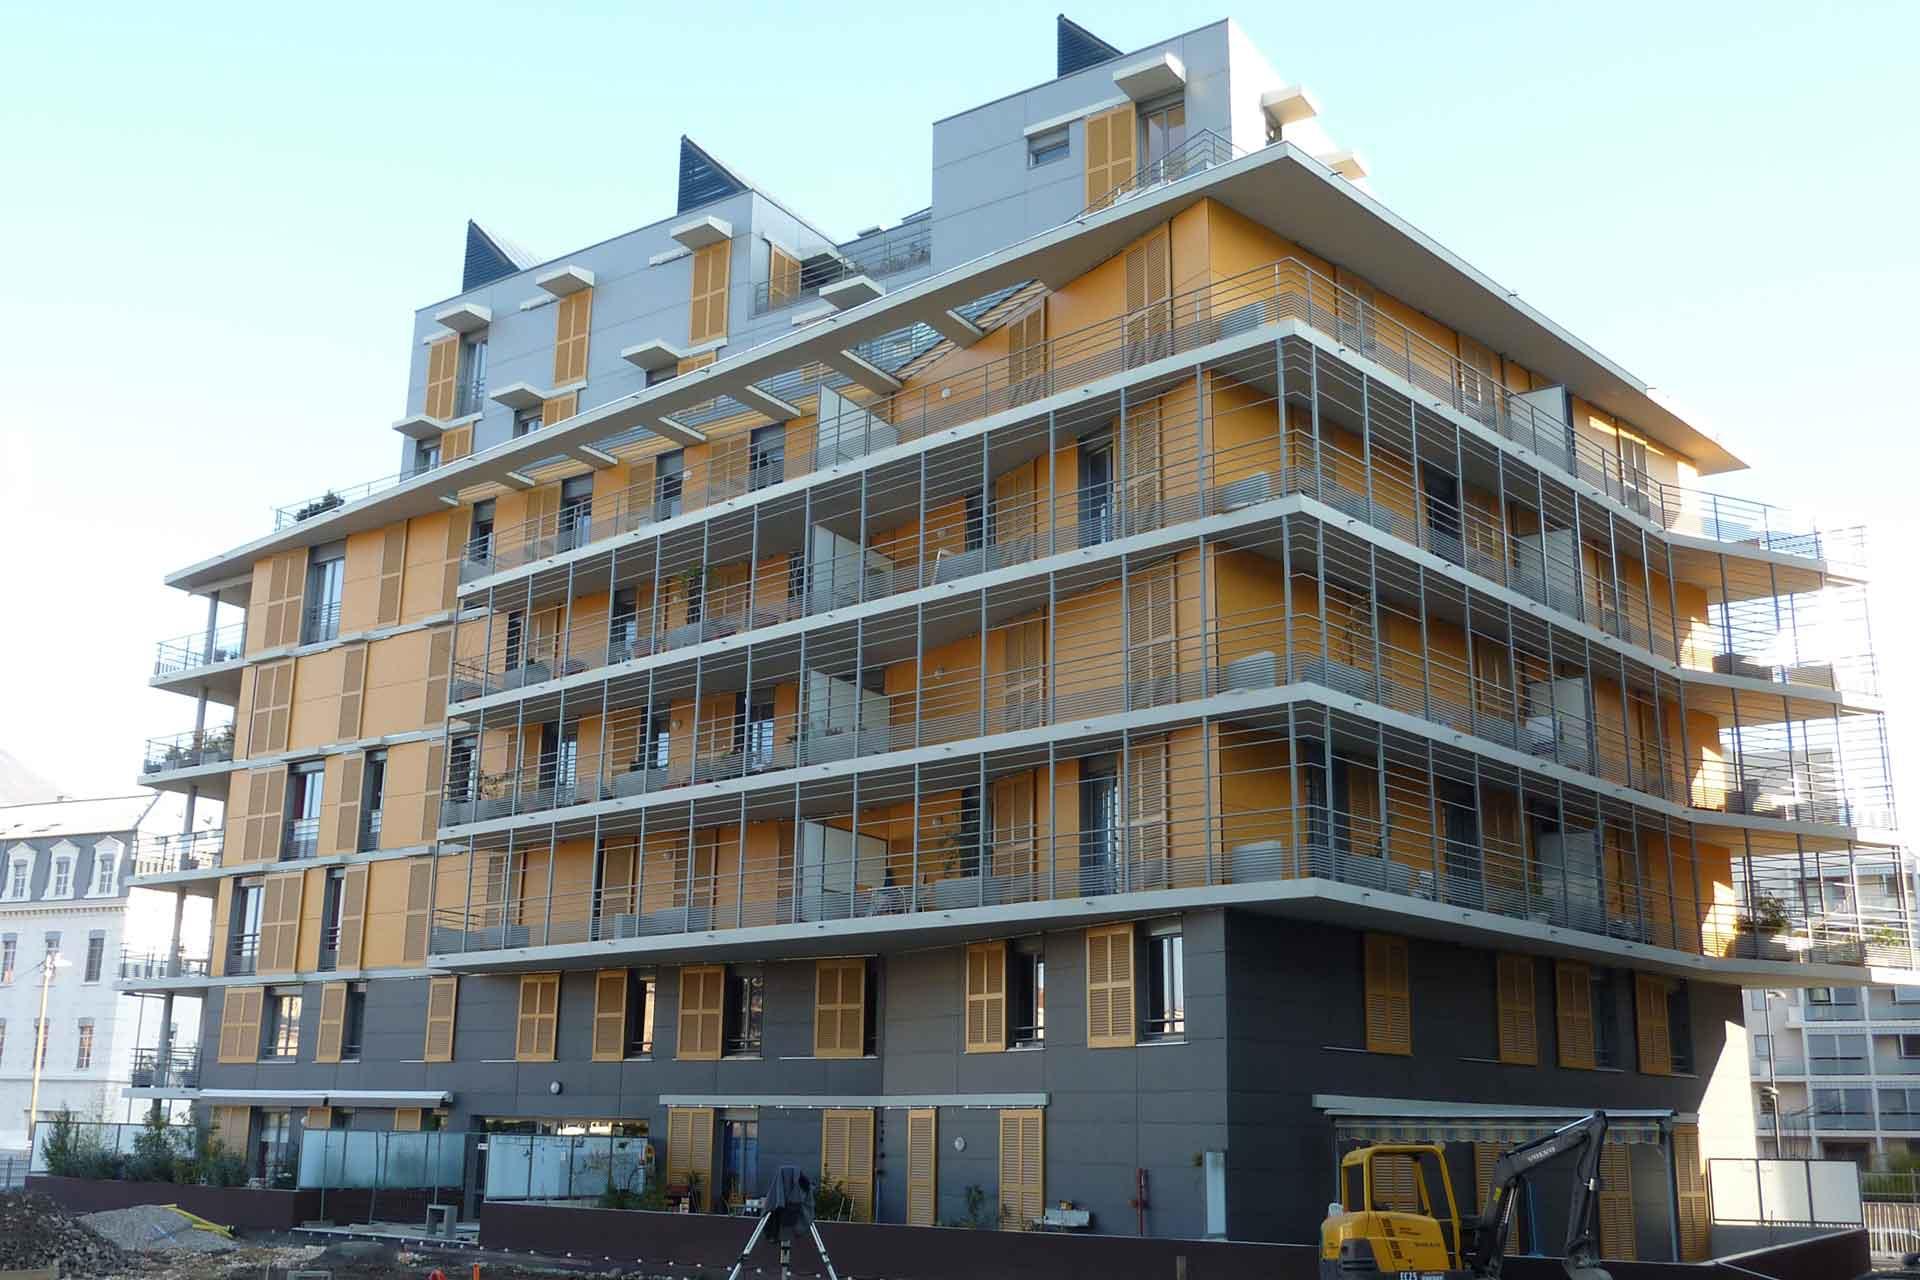 107-logement-vendome-img-(1)